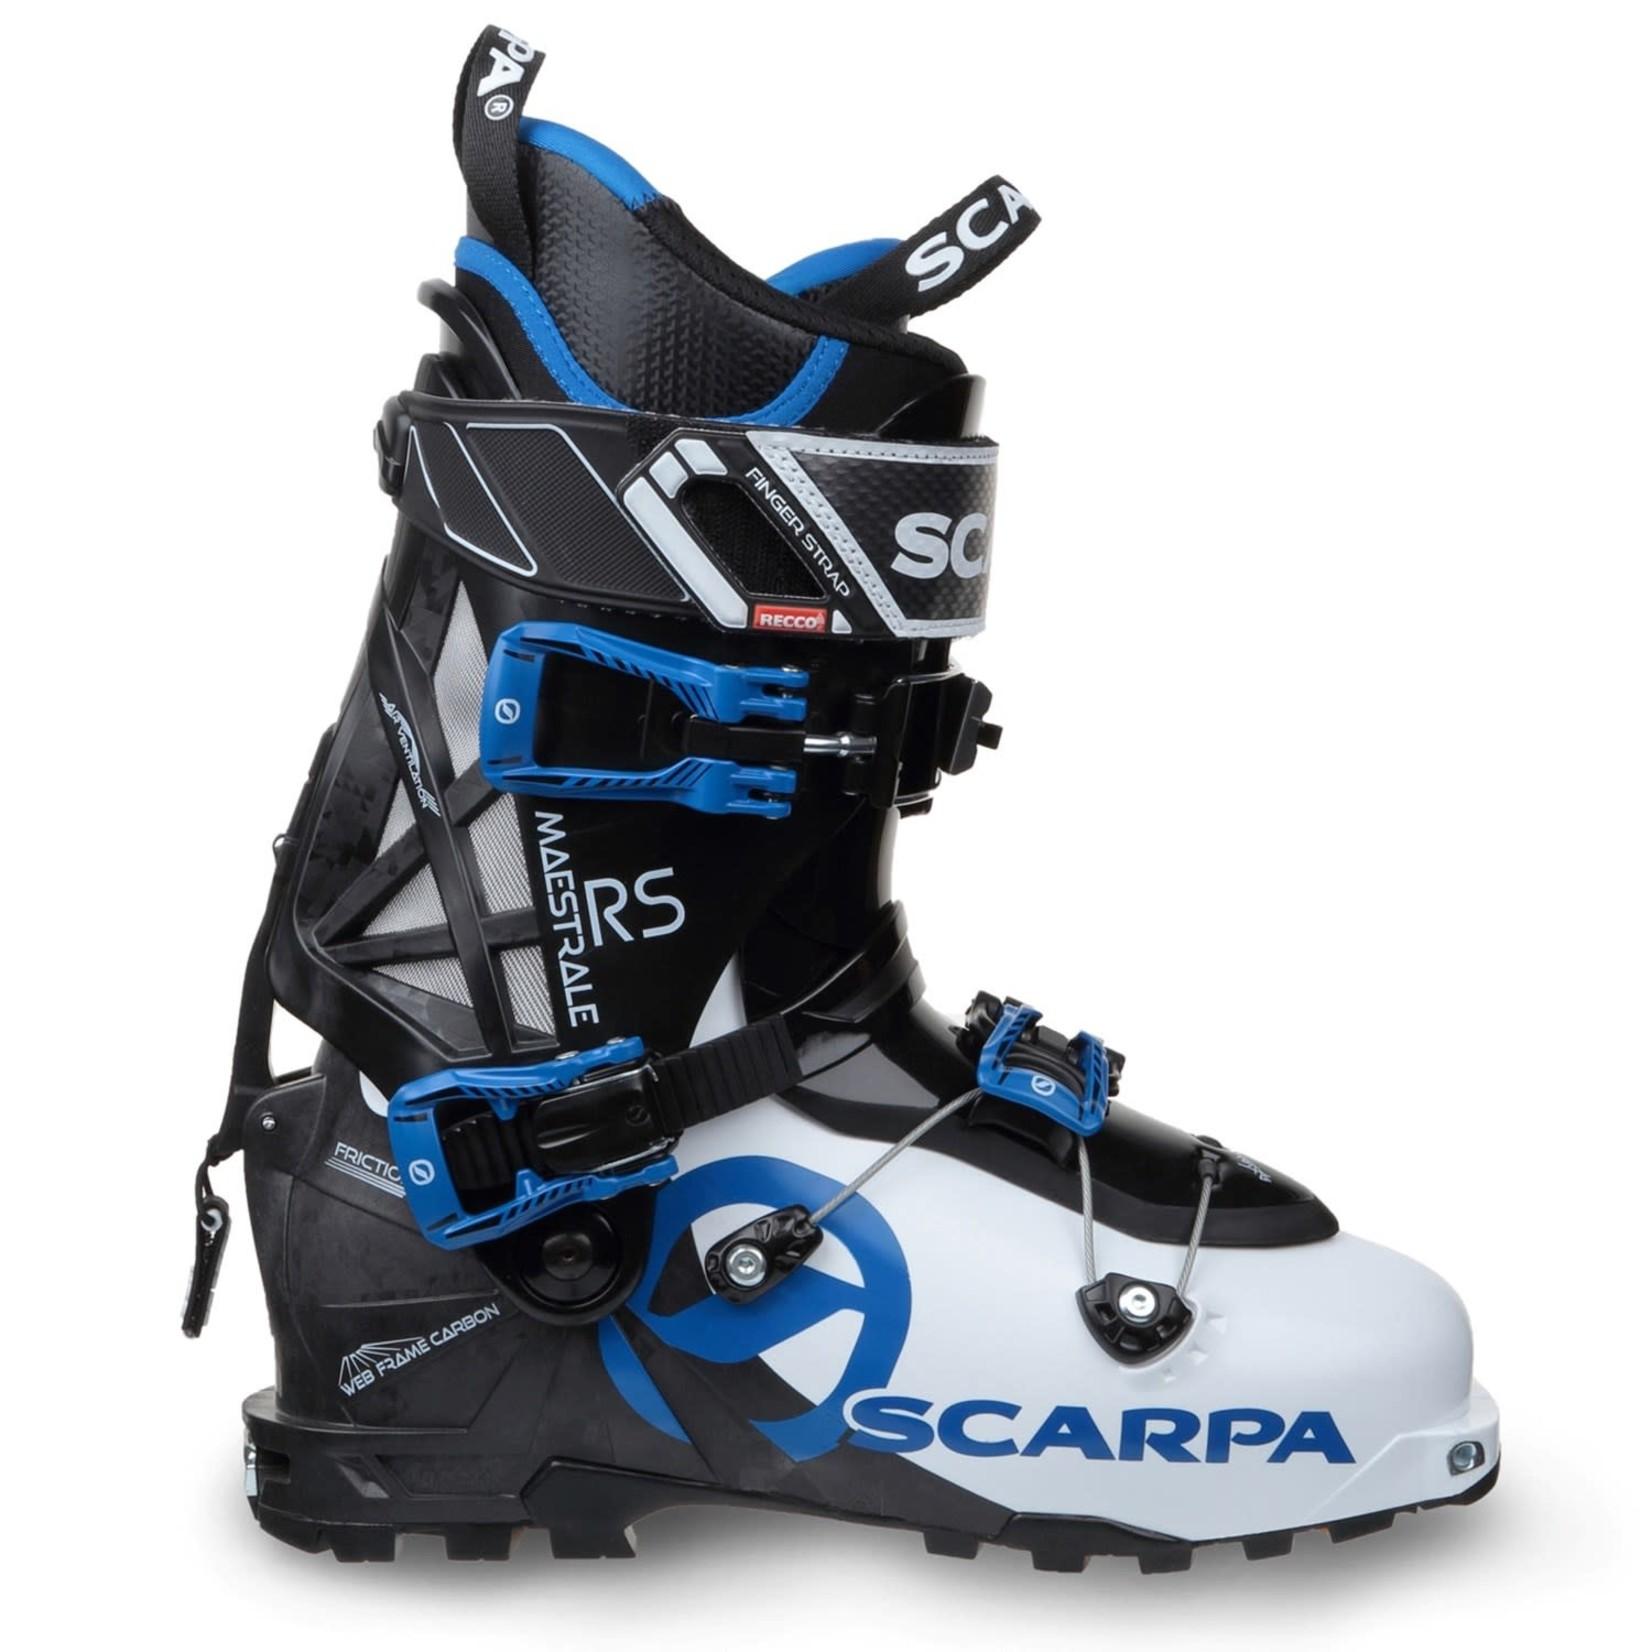 Scarpa Bottes de ski Scarpa Maestrale RS - Hommes